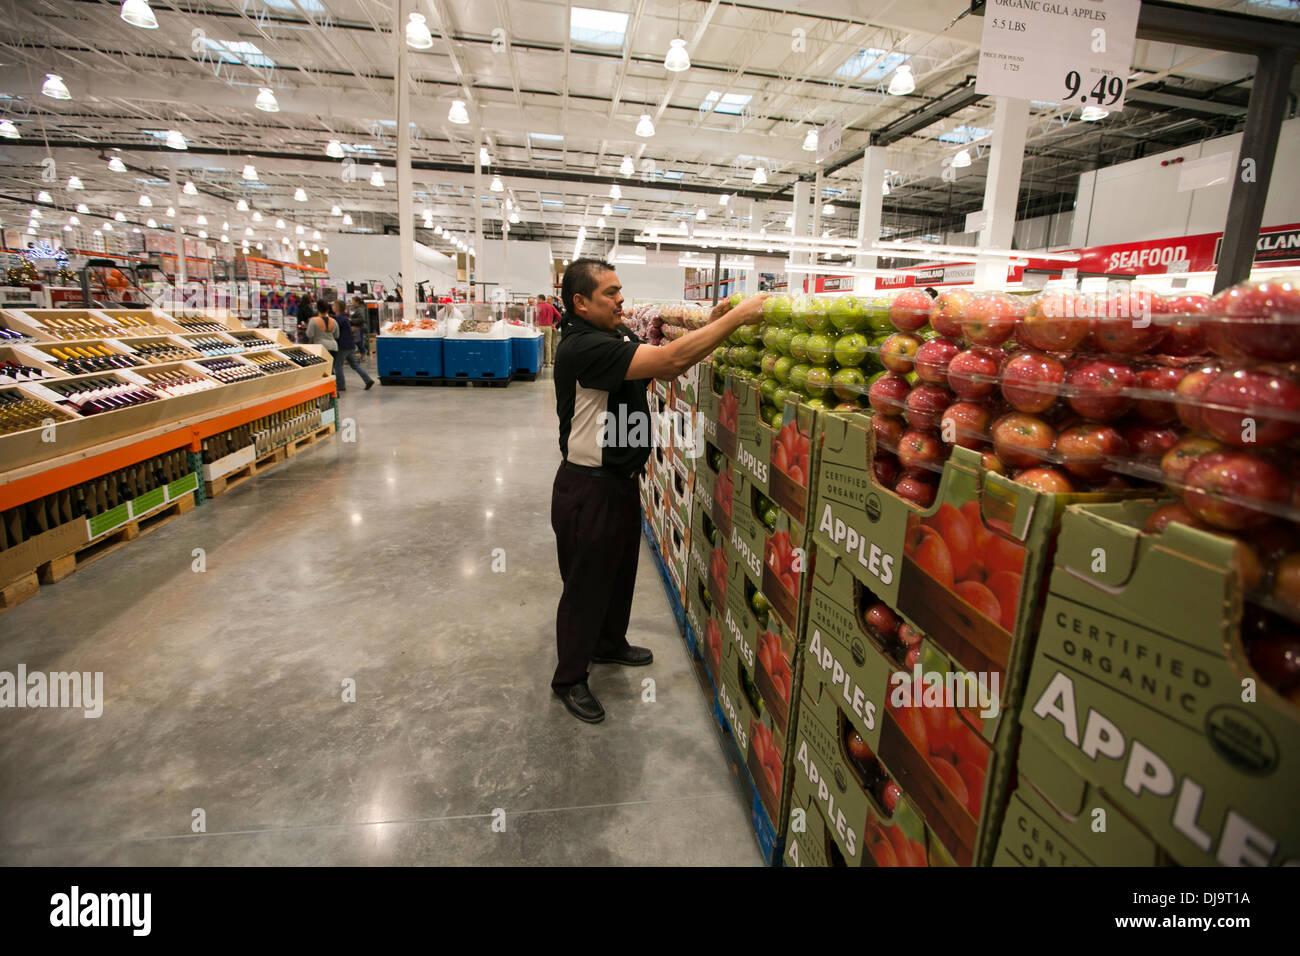 Costco Employees Stock Photos & Costco Employees Stock Images - Alamy